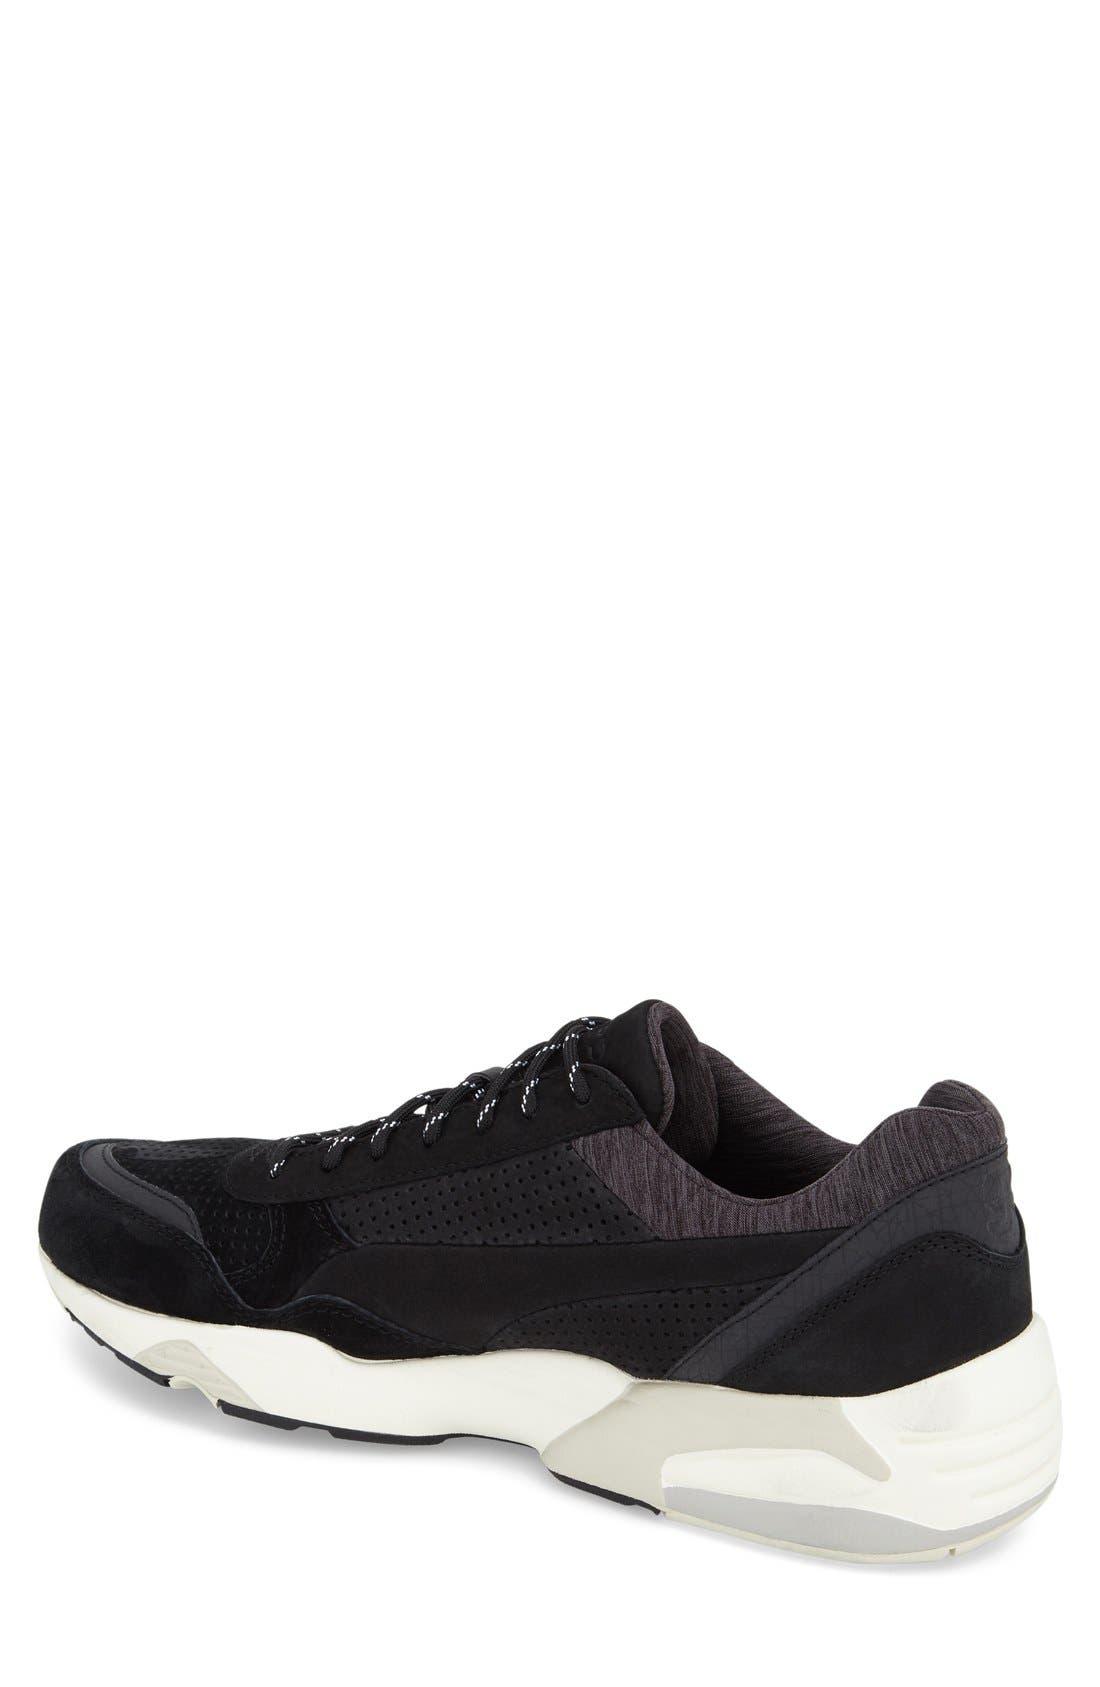 'R698 X STAMPD' Sneaker,                             Alternate thumbnail 2, color,                             Black